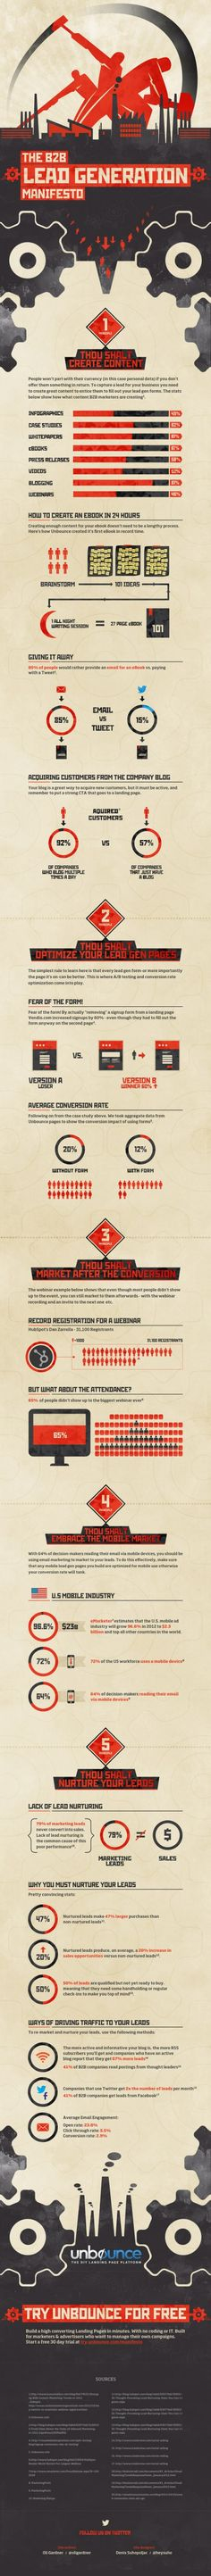 The B2B Lead Generation Manifesto - http://www.toprankblog.com/2012/10/b2b-lead-generation-manifesto-infographic/